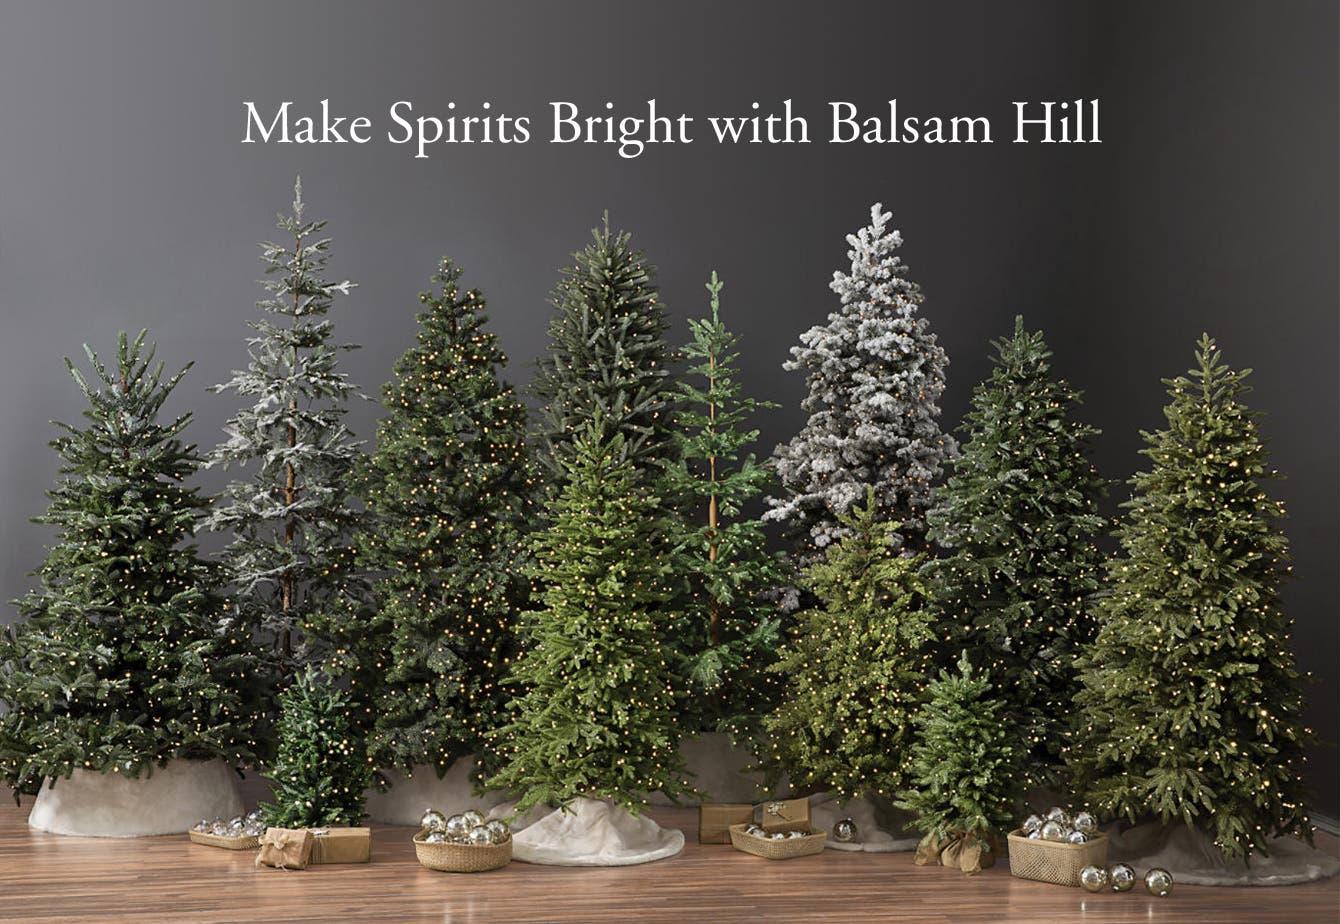 Make Spirits Bright with Balsam Hill